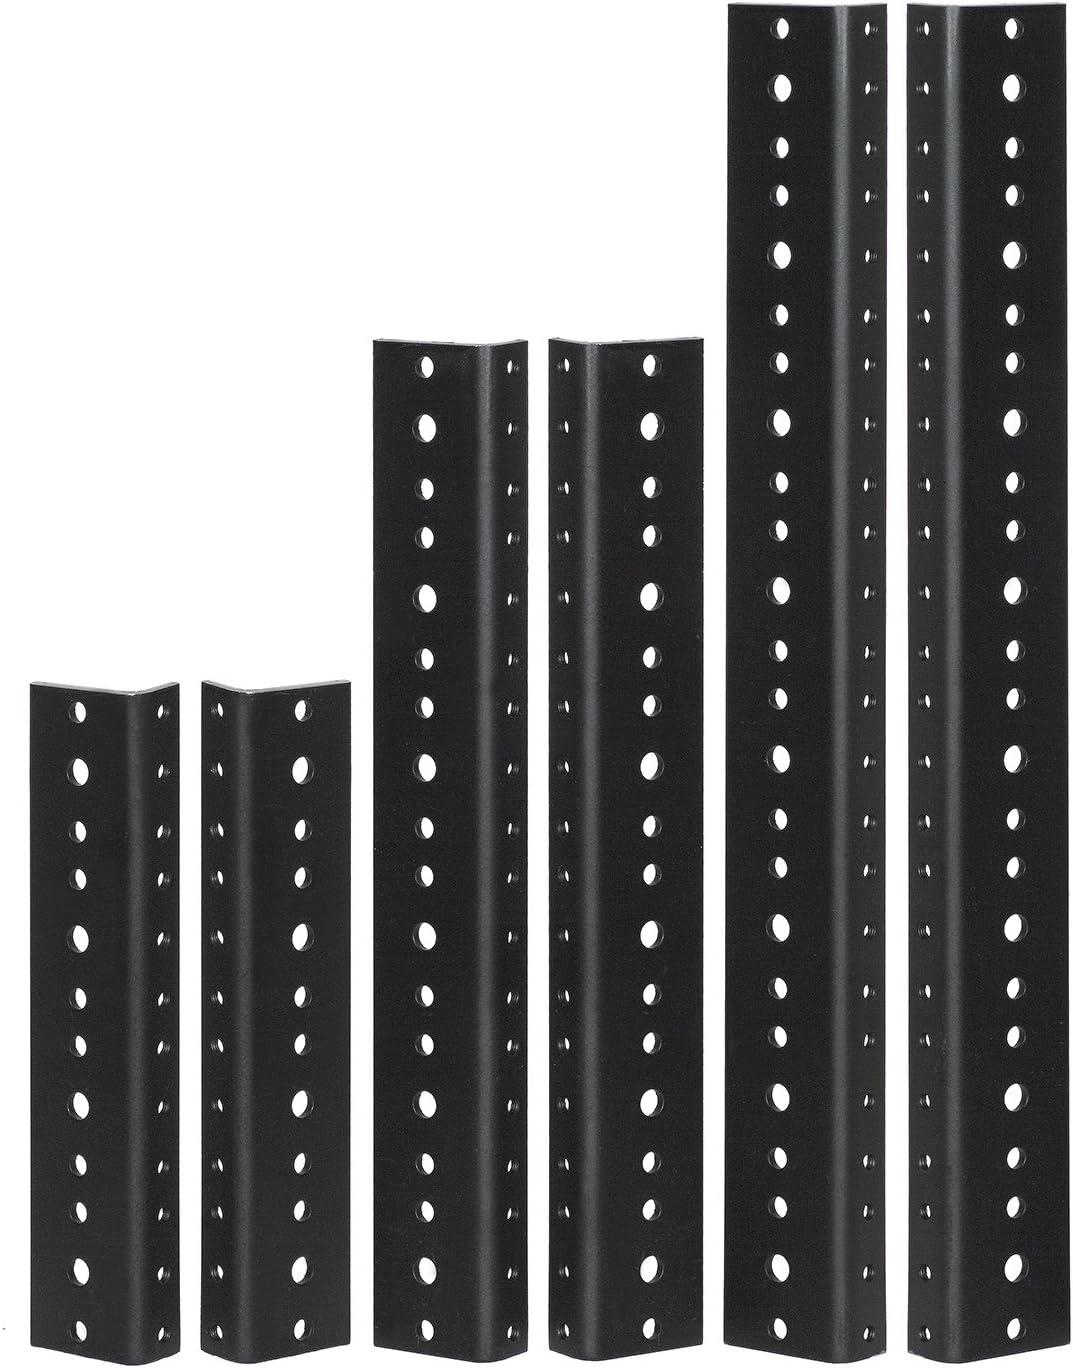 Reliable Hardware Company RH-8-SRR-A Popular Max 86% OFF popular Black Rack Rail